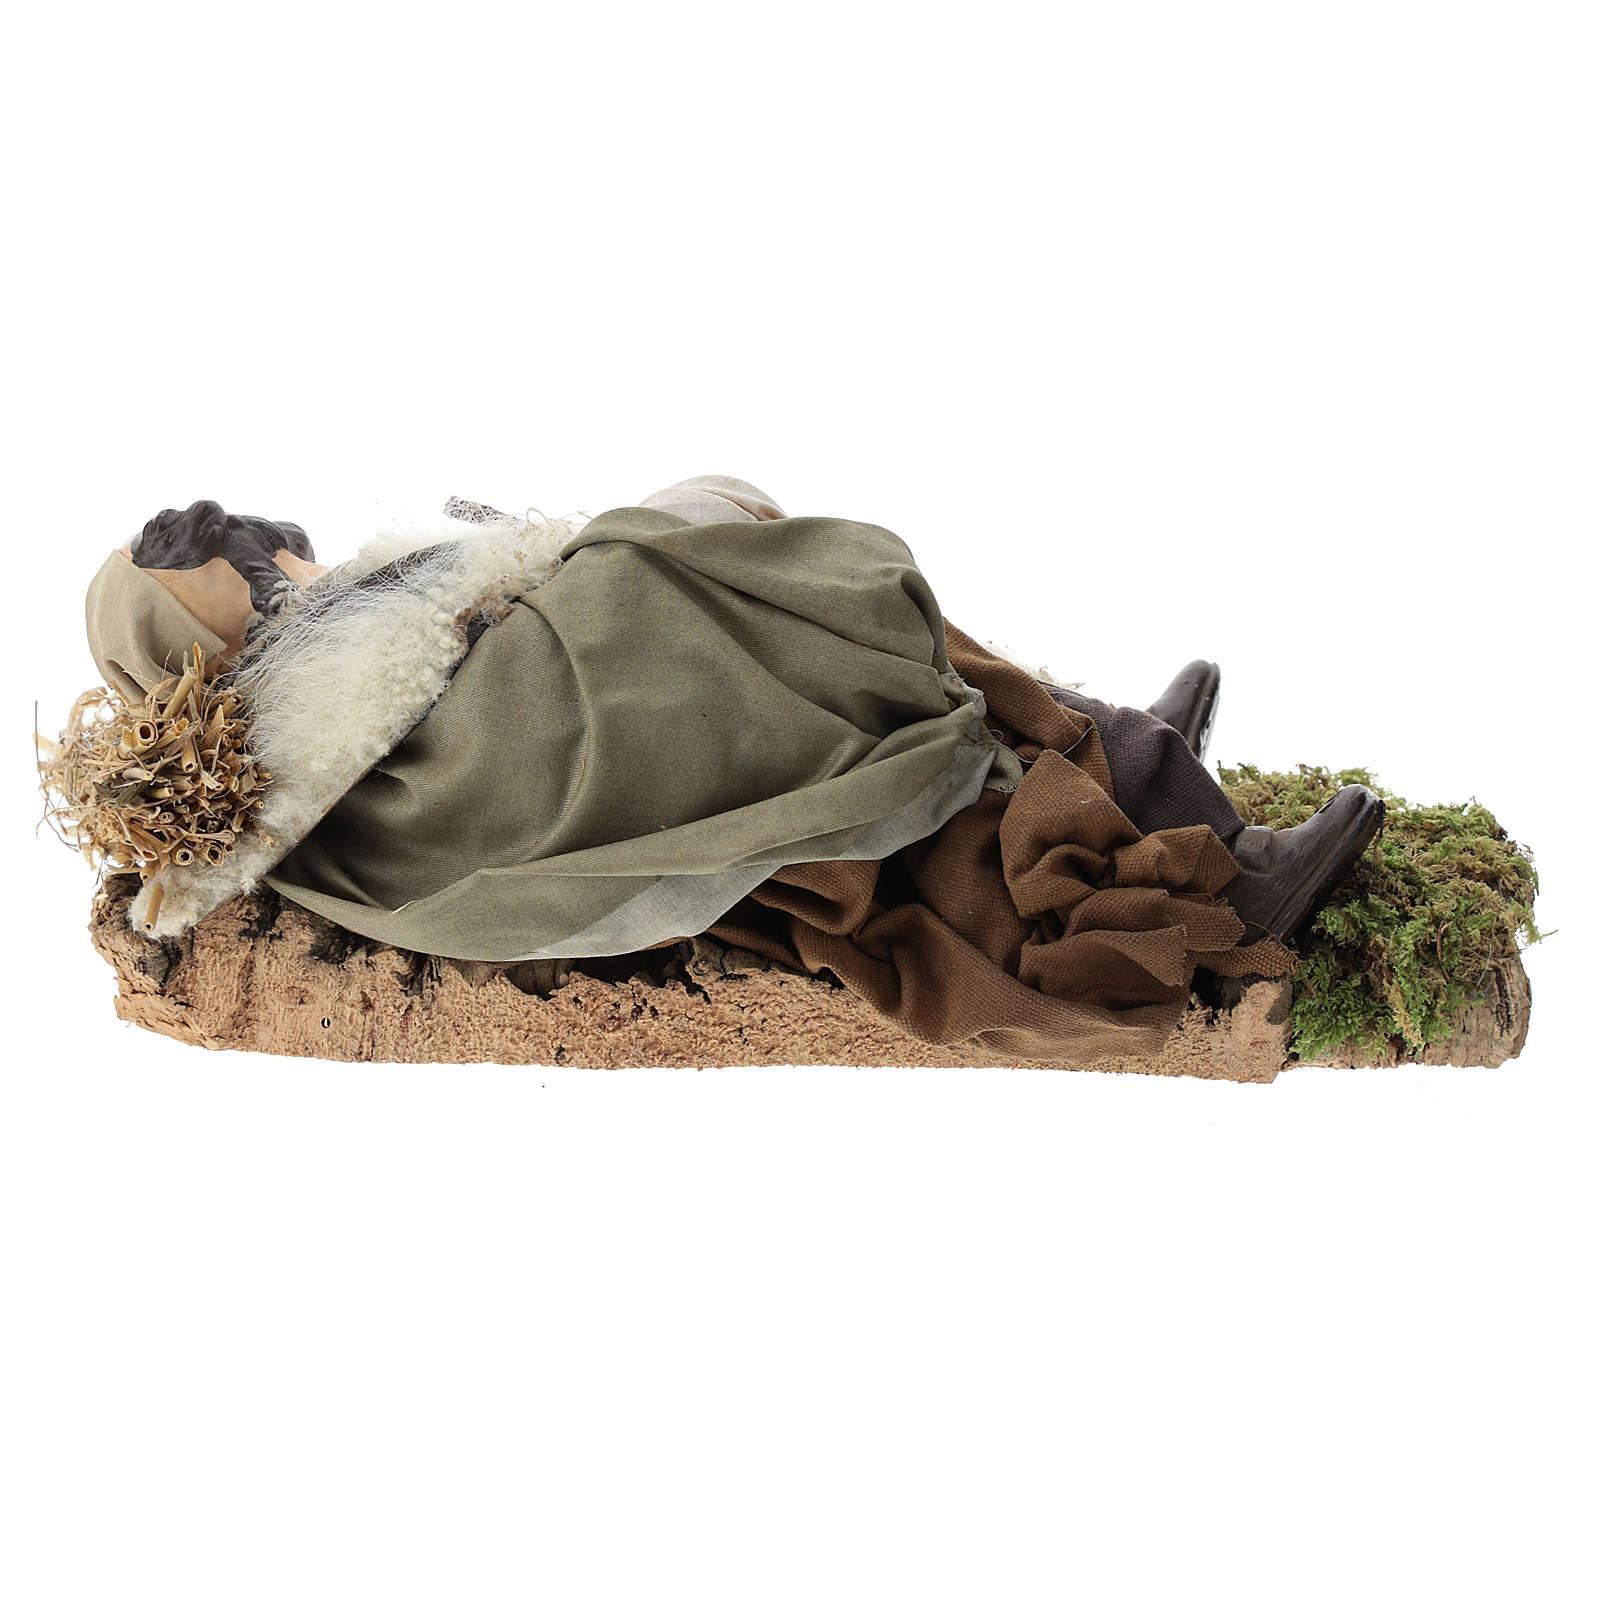 Neapolitan nativity figurine, resting traveler 30cm 4